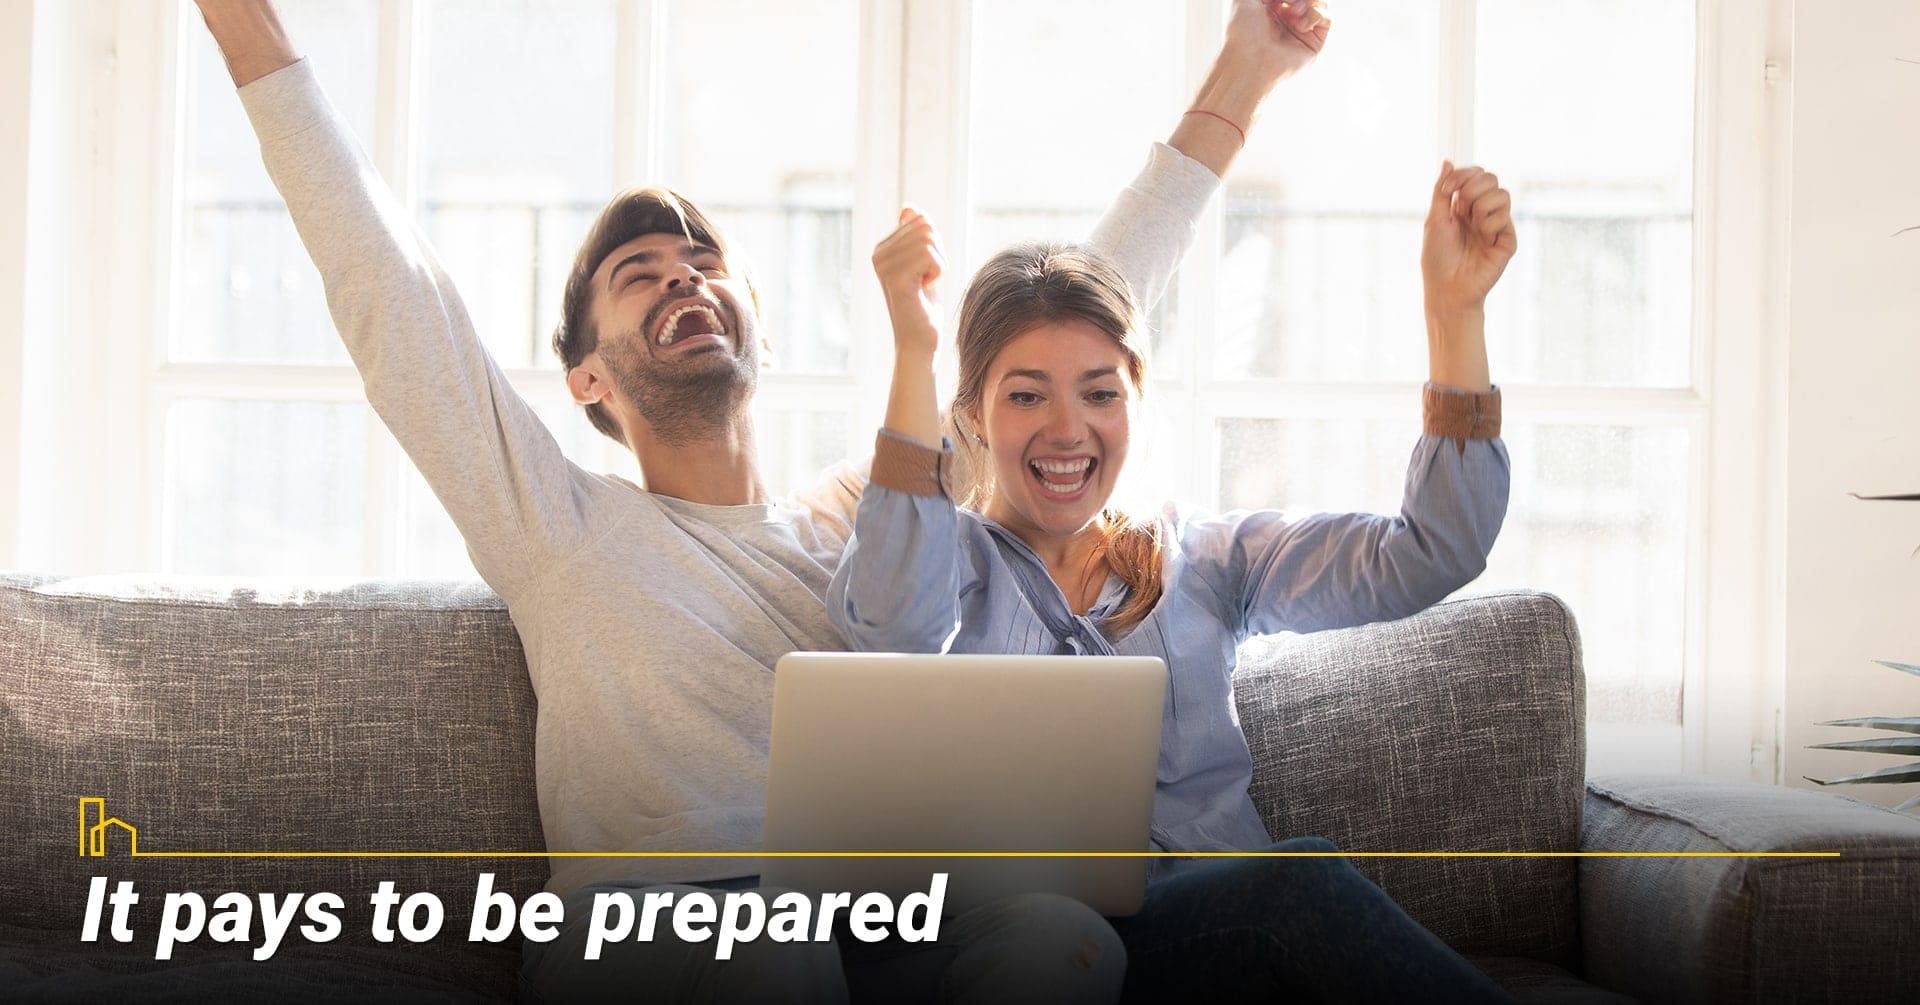 It pays to be prepared, prepare and reward